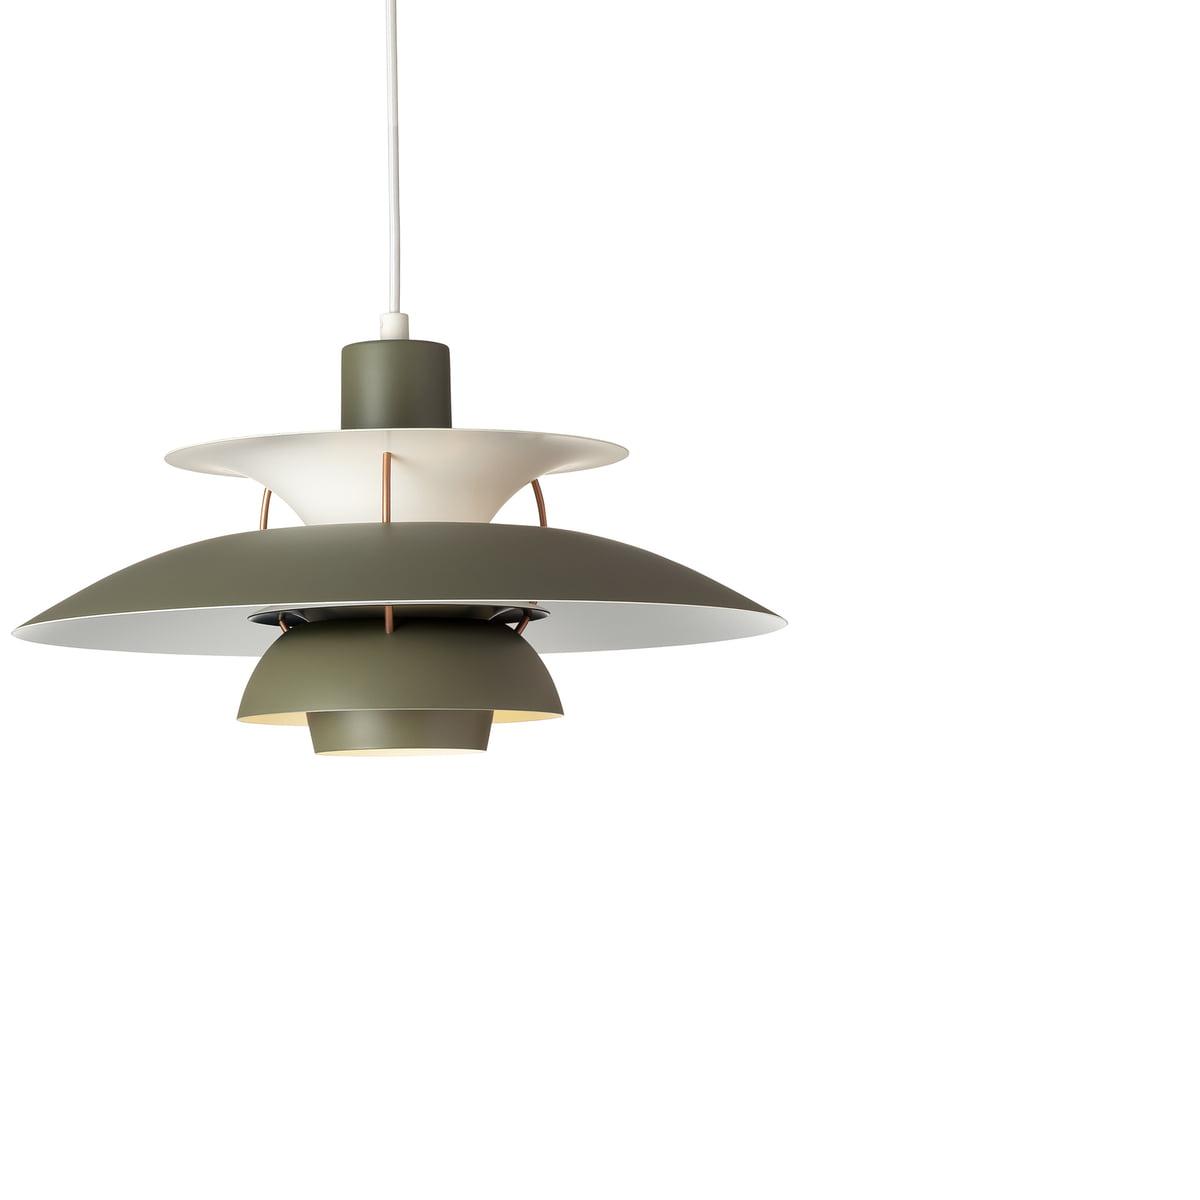 ph lighting. Louis Poulsen - PH 5 Pendant Light, Army Green / Darkgrey Ph Lighting